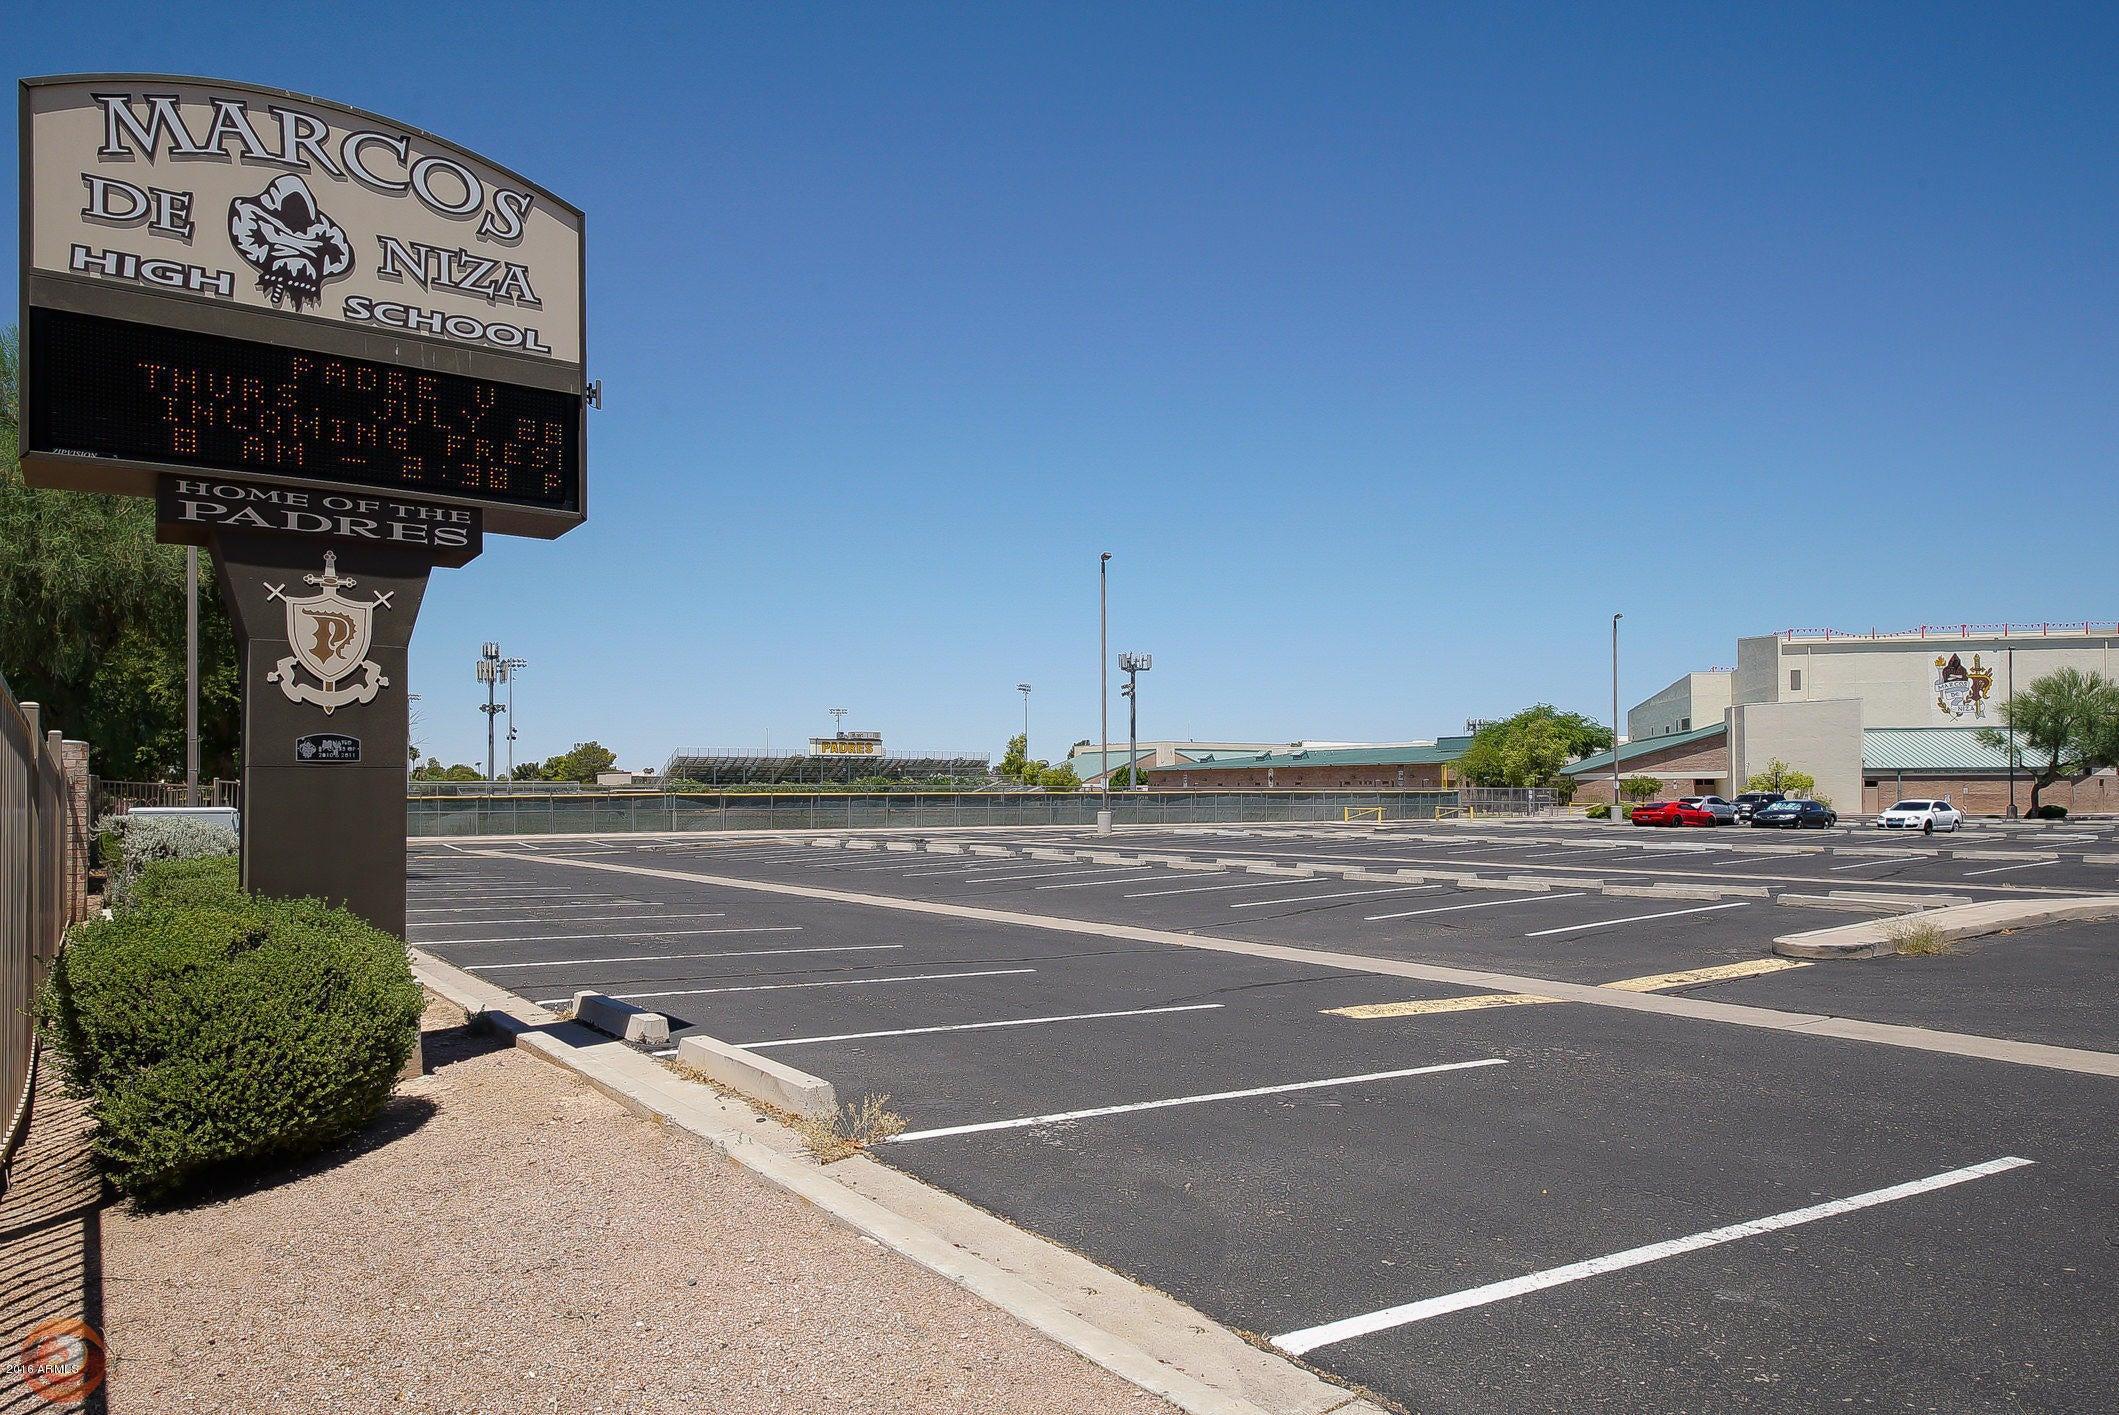 MLS 5473723 6518 S NEWBERRY Road Unit B, Tempe, AZ 85283 Tempe AZ Condo or Townhome